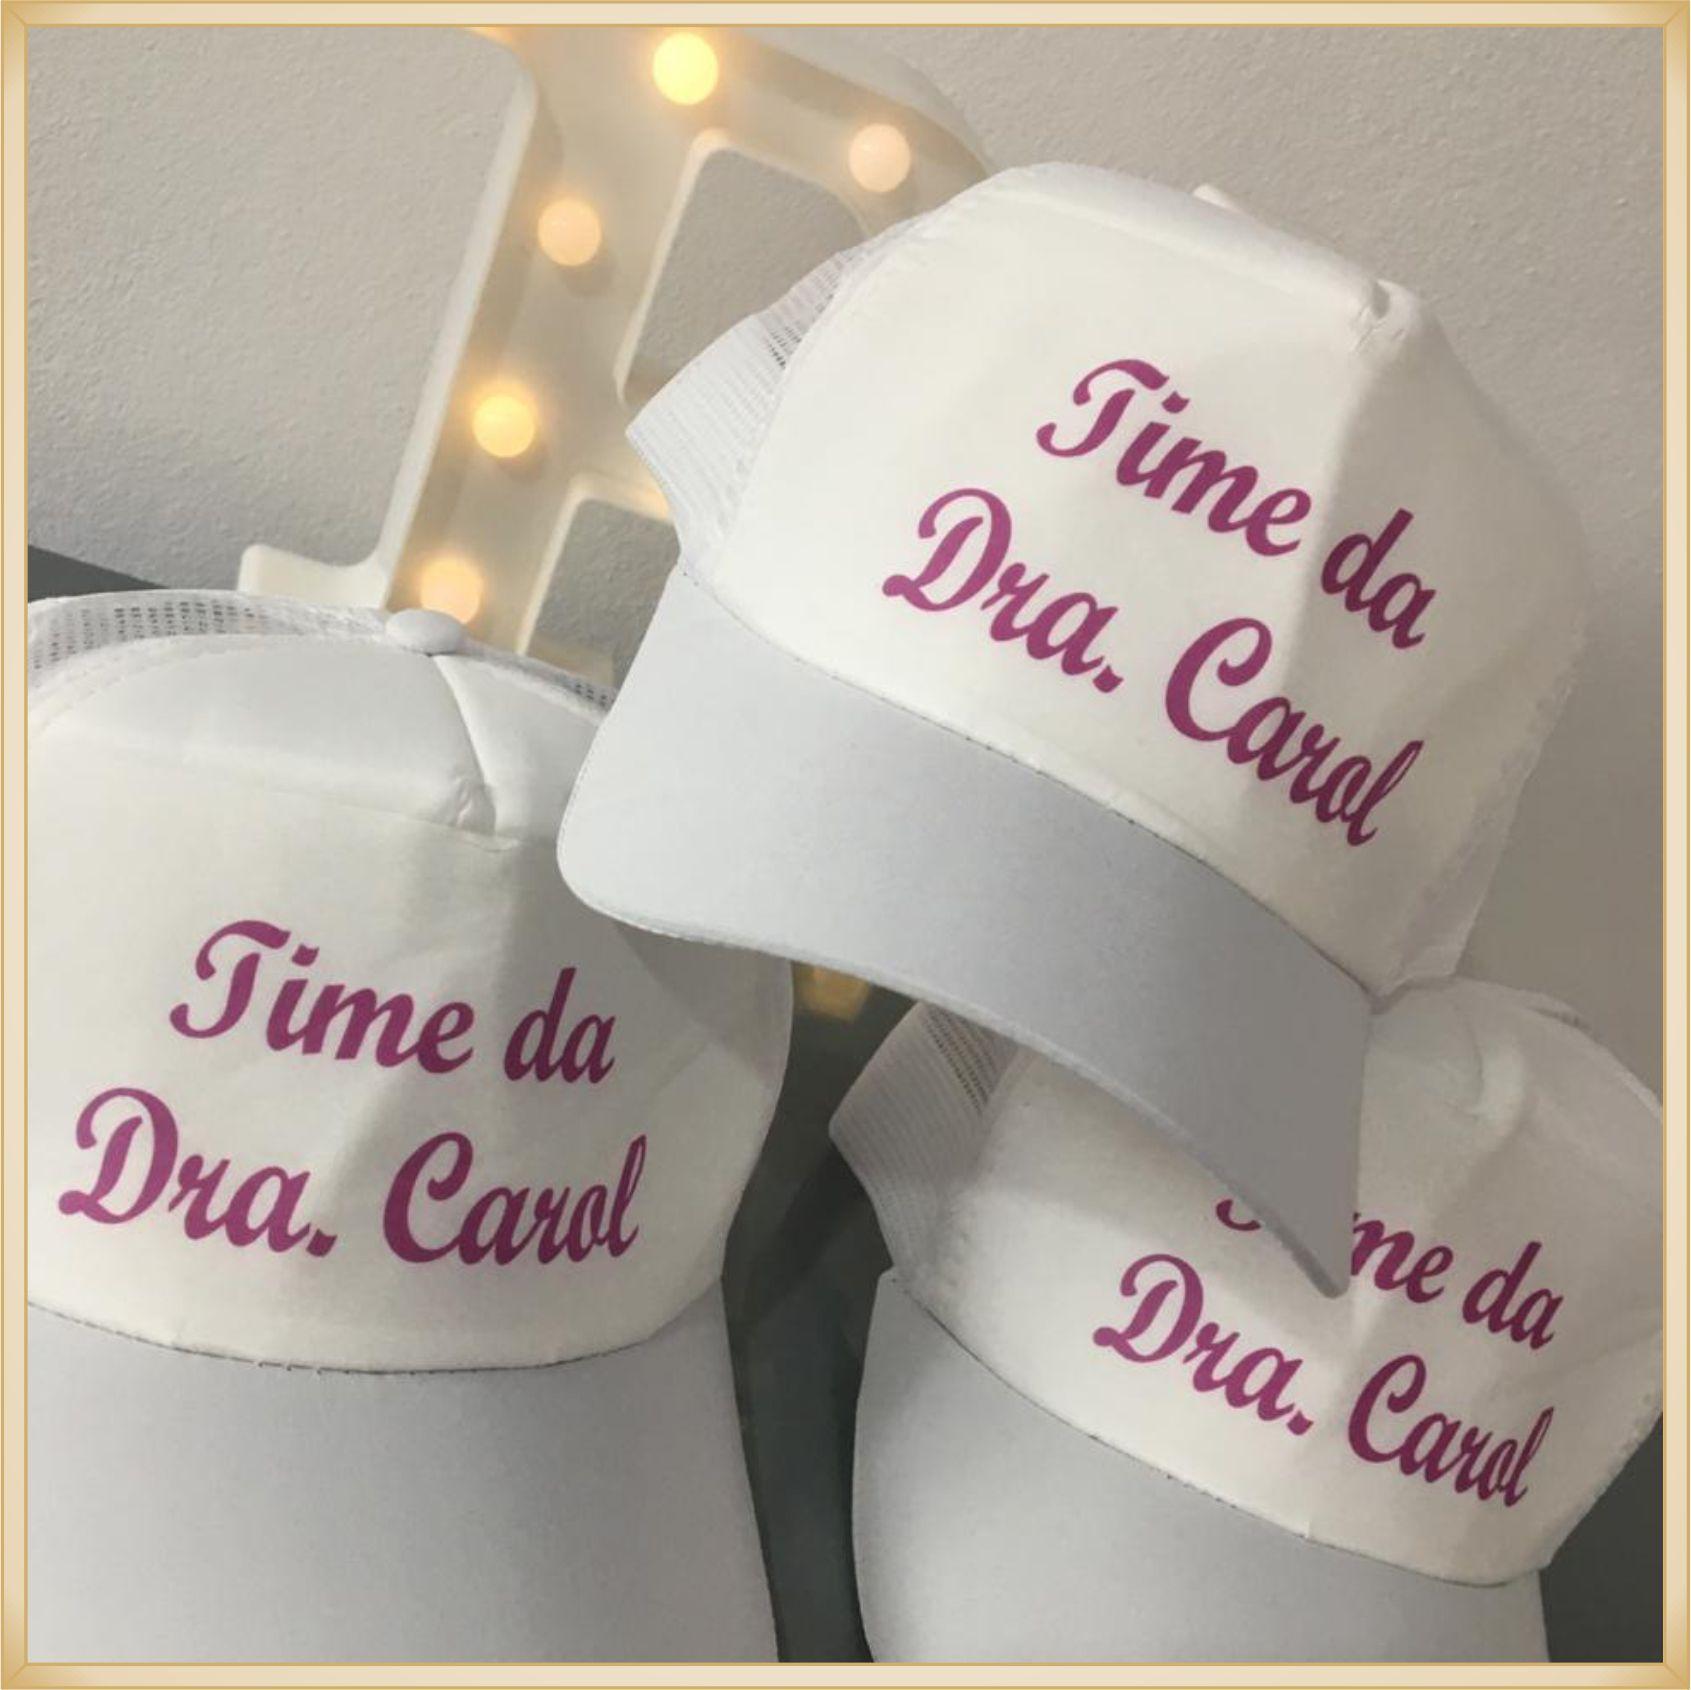 10 Bonés Personalizados para Baile de Formatura, Coquetel de cursos, Festa de Formandos e Churrasco dos amigos.